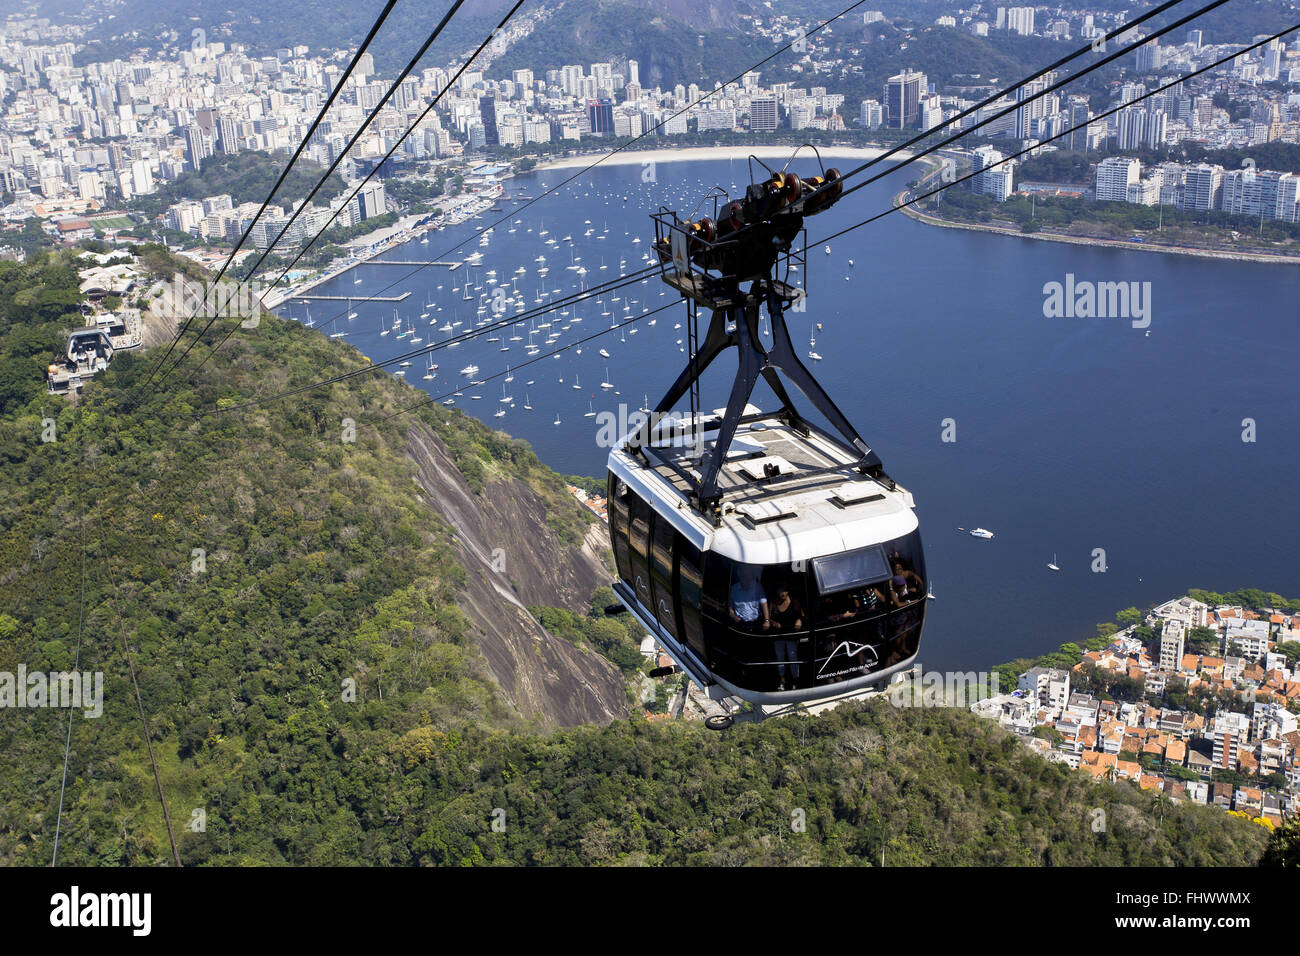 Monorail leaving Morro da Urca toward the Pao de Acucar - Botafogo Beach and Inlet Incidental Stock Photo